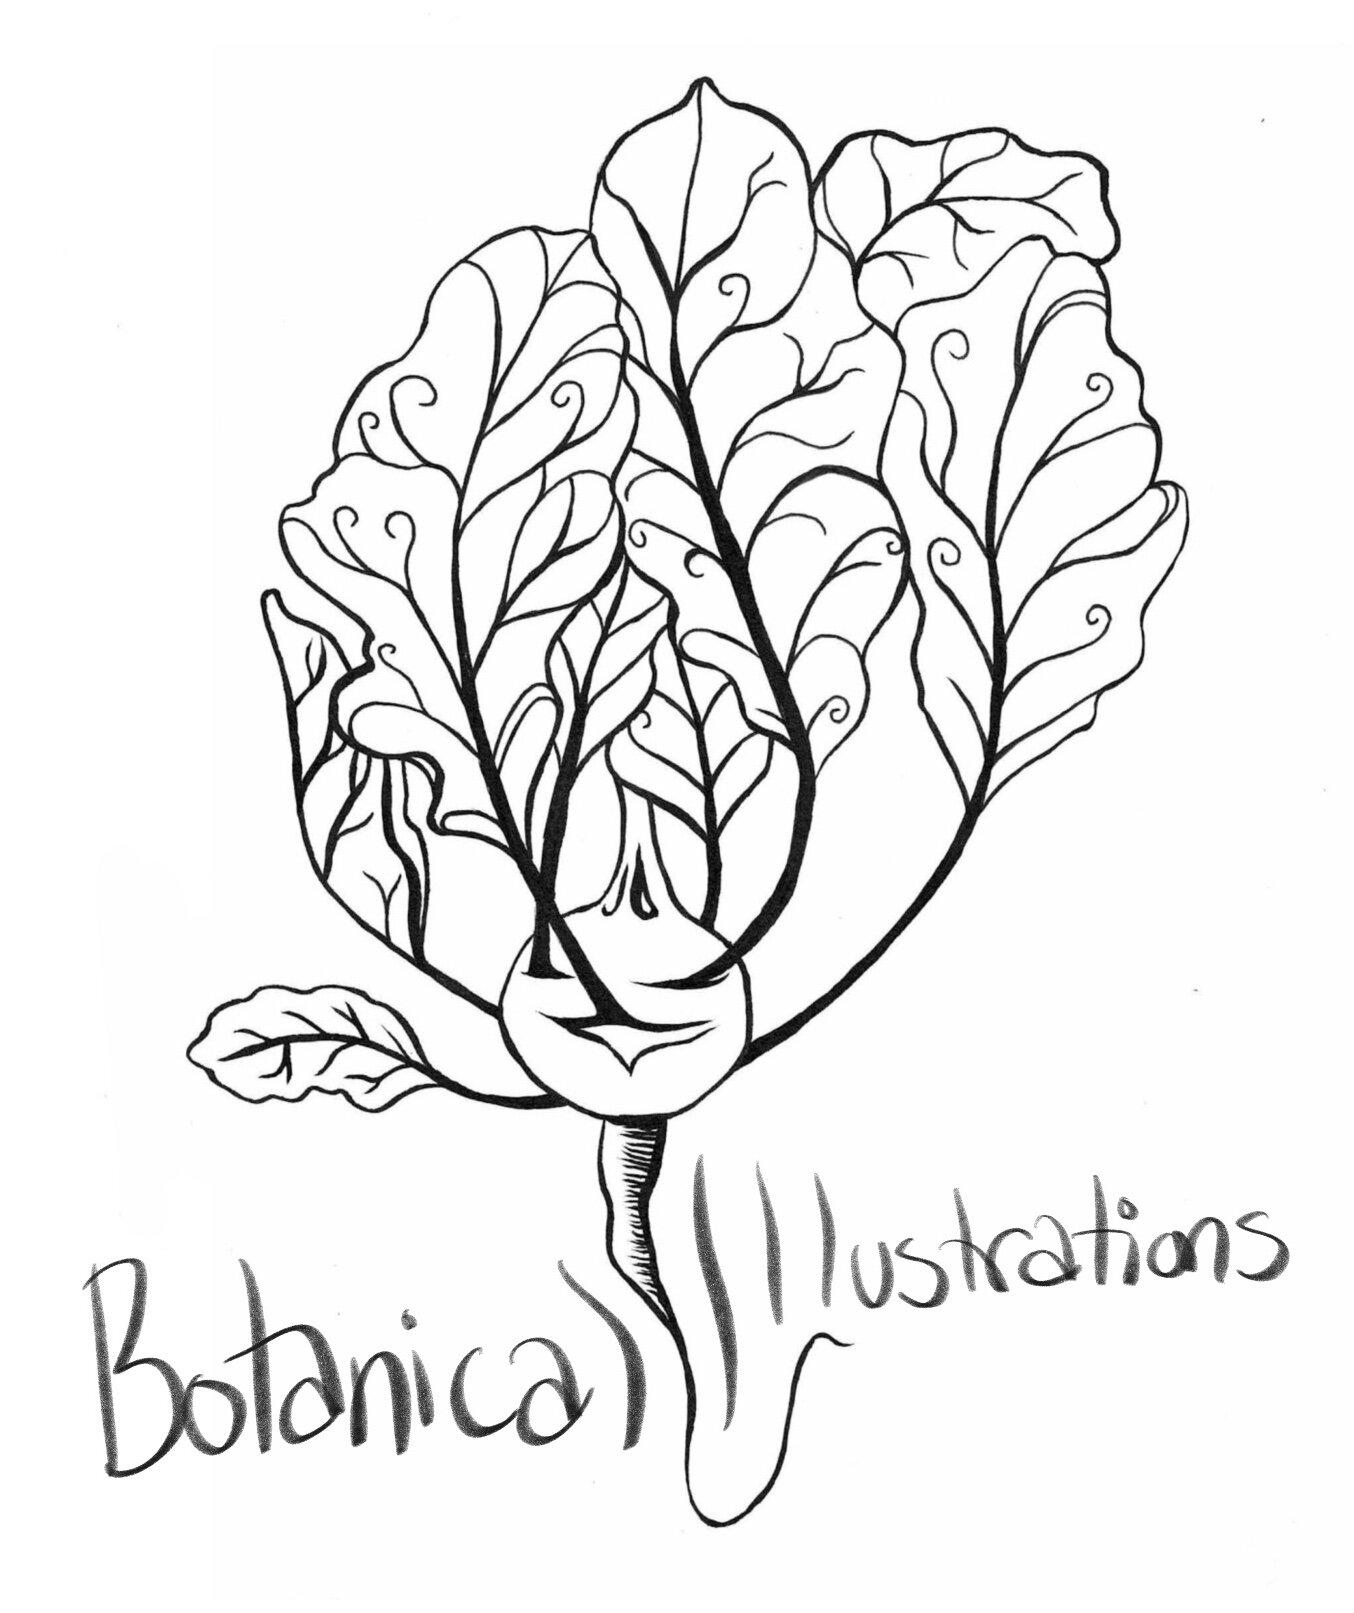 Botanical_Illustrations.jpg